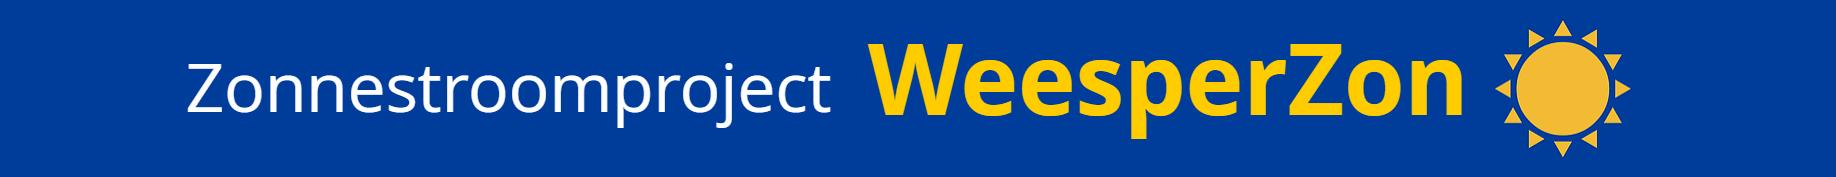 weesperzon logo laptop